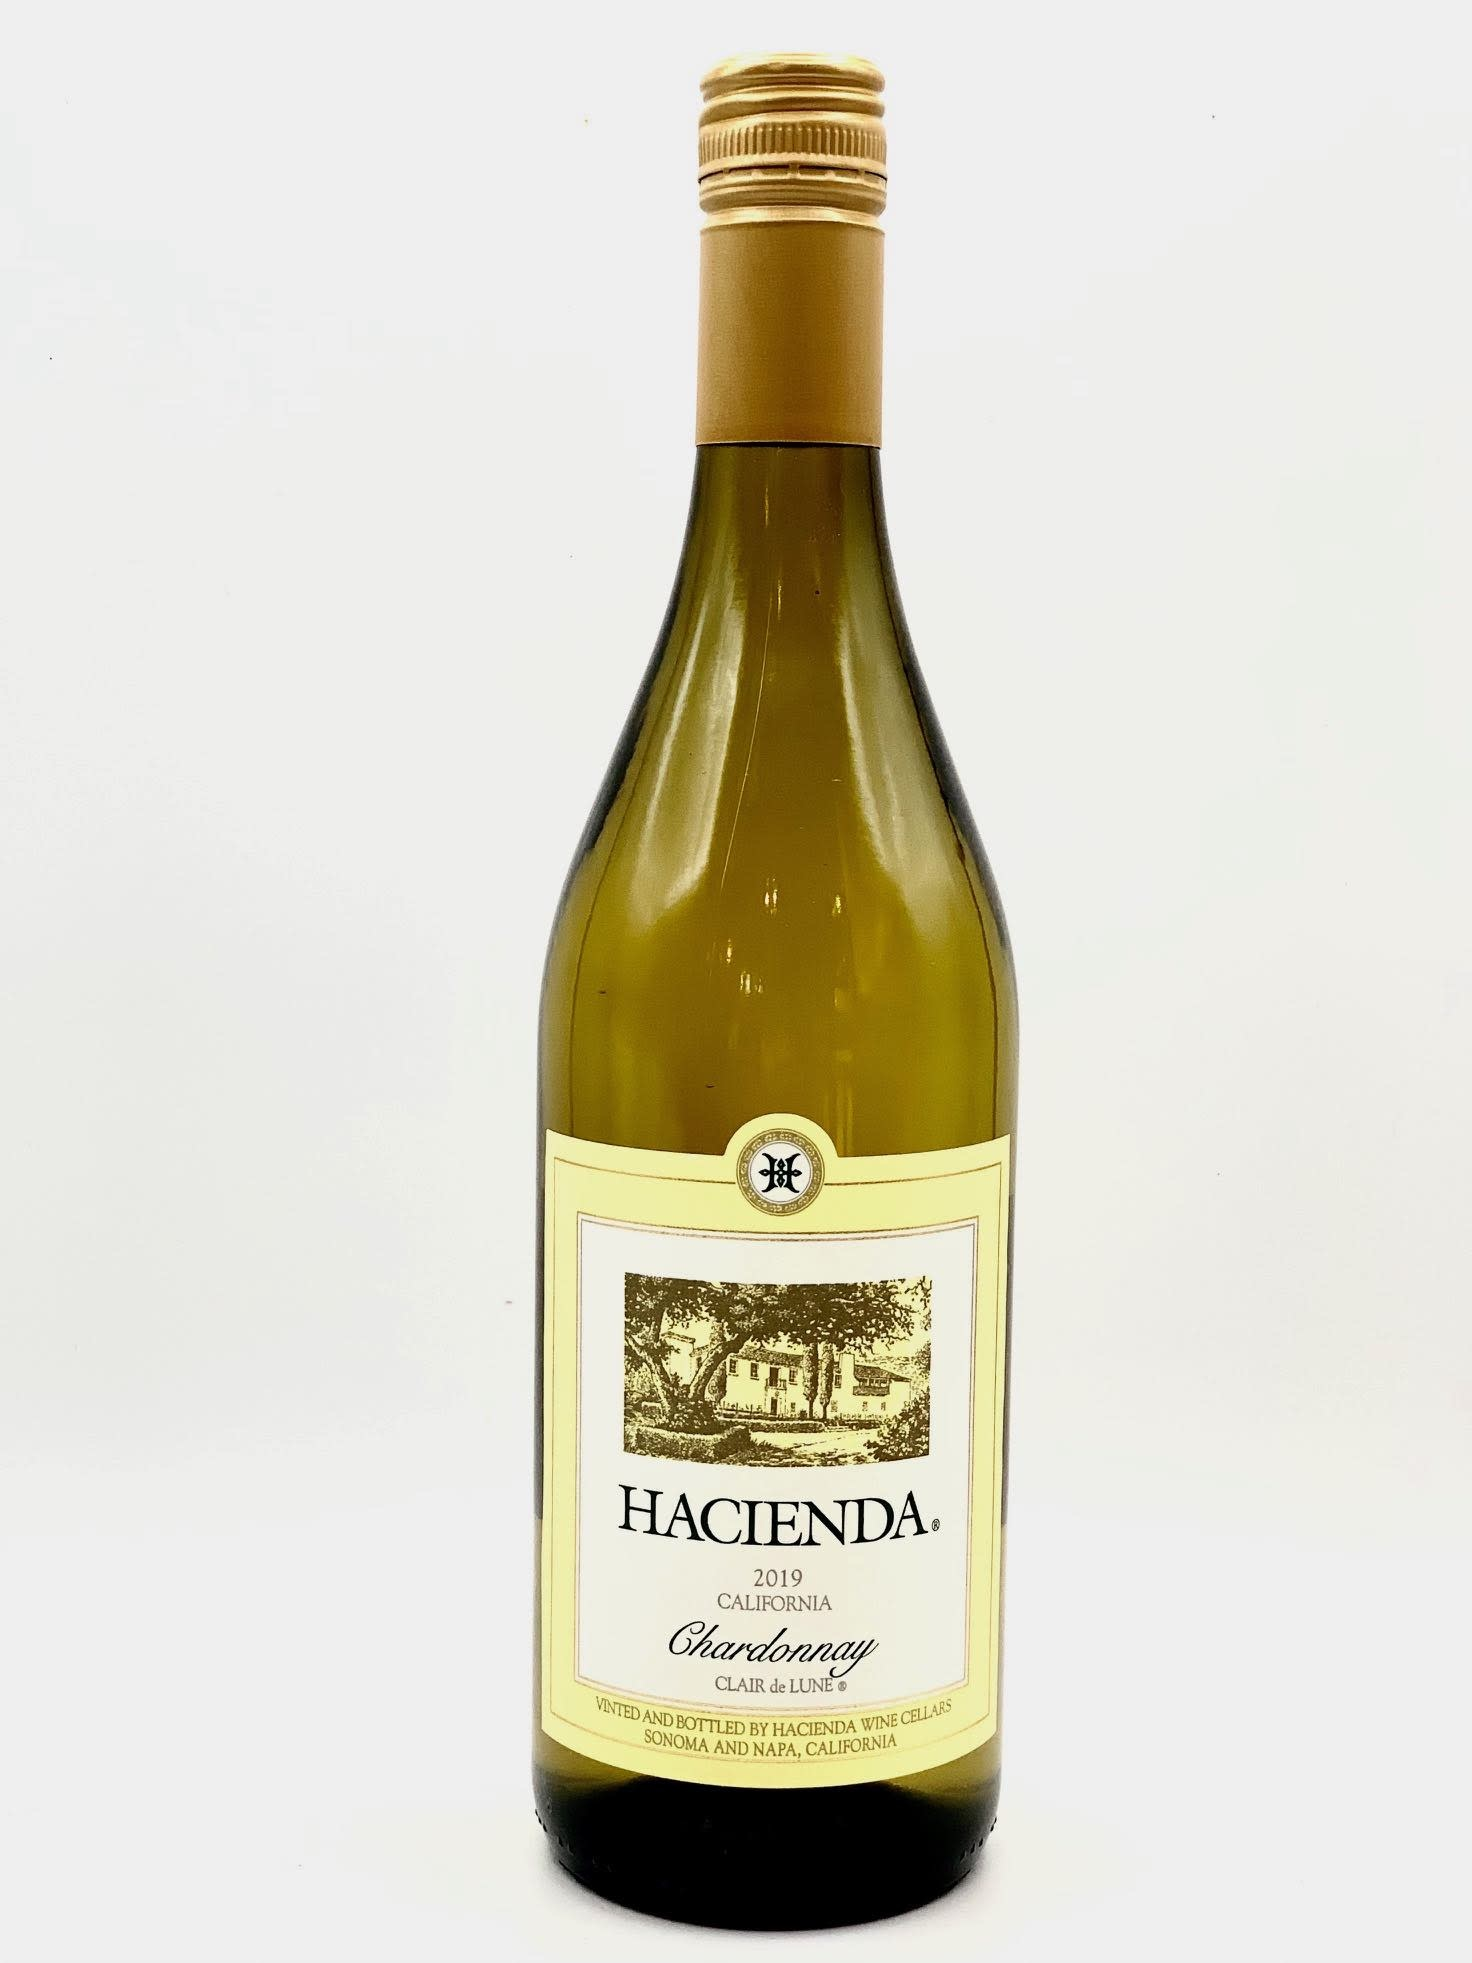 California Chardonnay 2019 Hacienda Wine Cellars 750ml